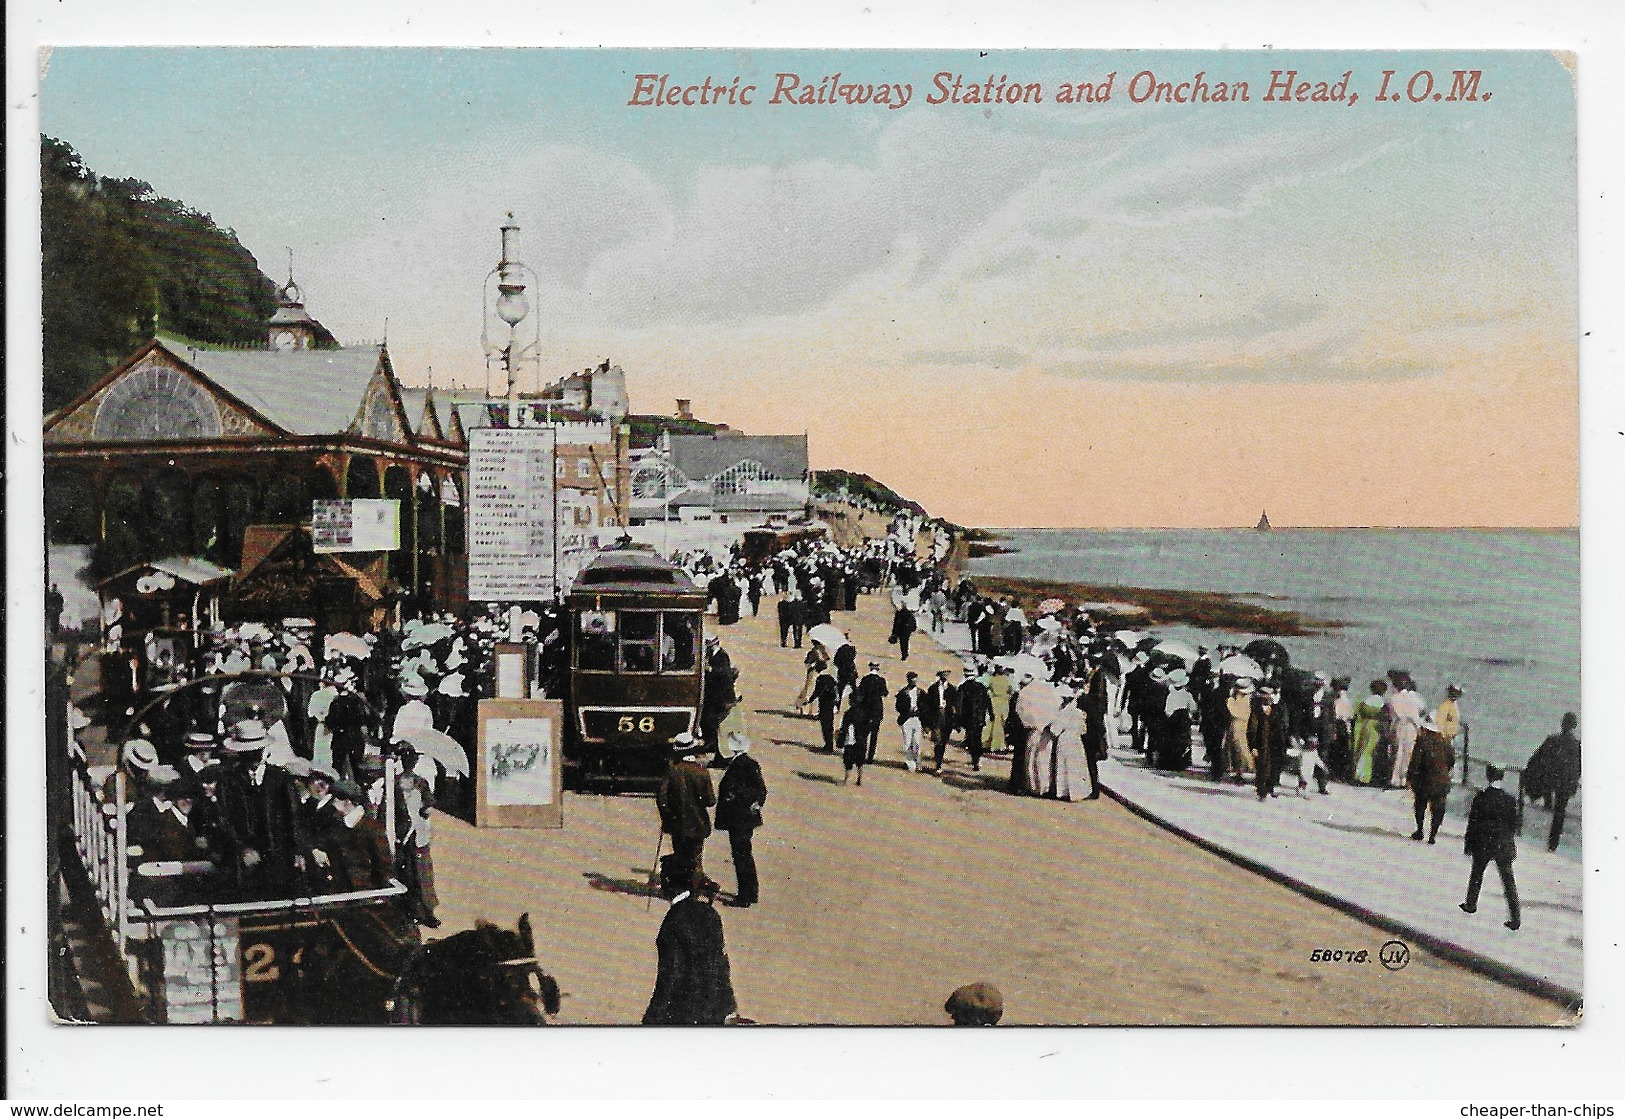 Electric Railway Station And Onchan Head - Valentine 58078? - Isle Of Man